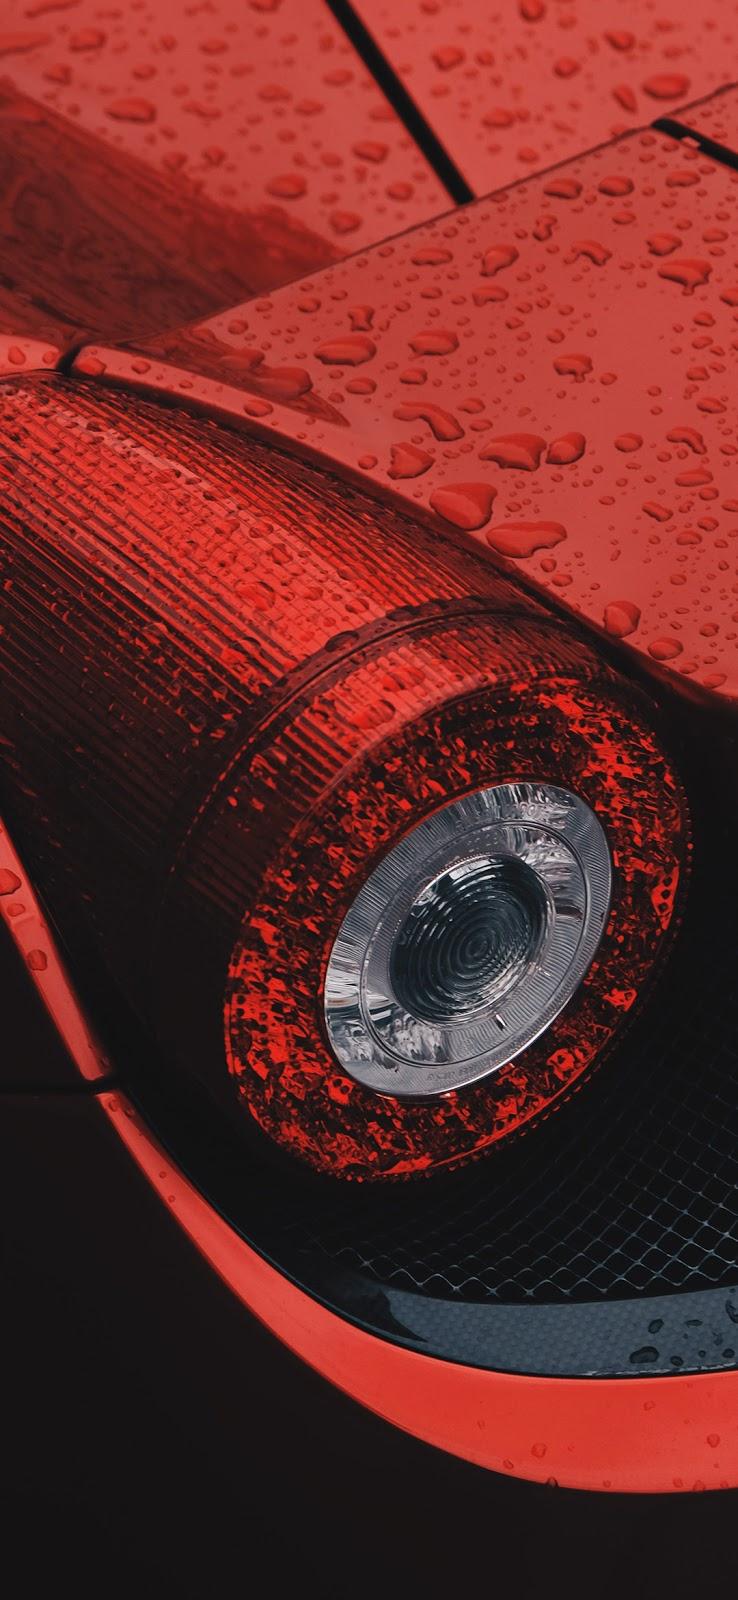 rain drops on red car tail light wallpaper